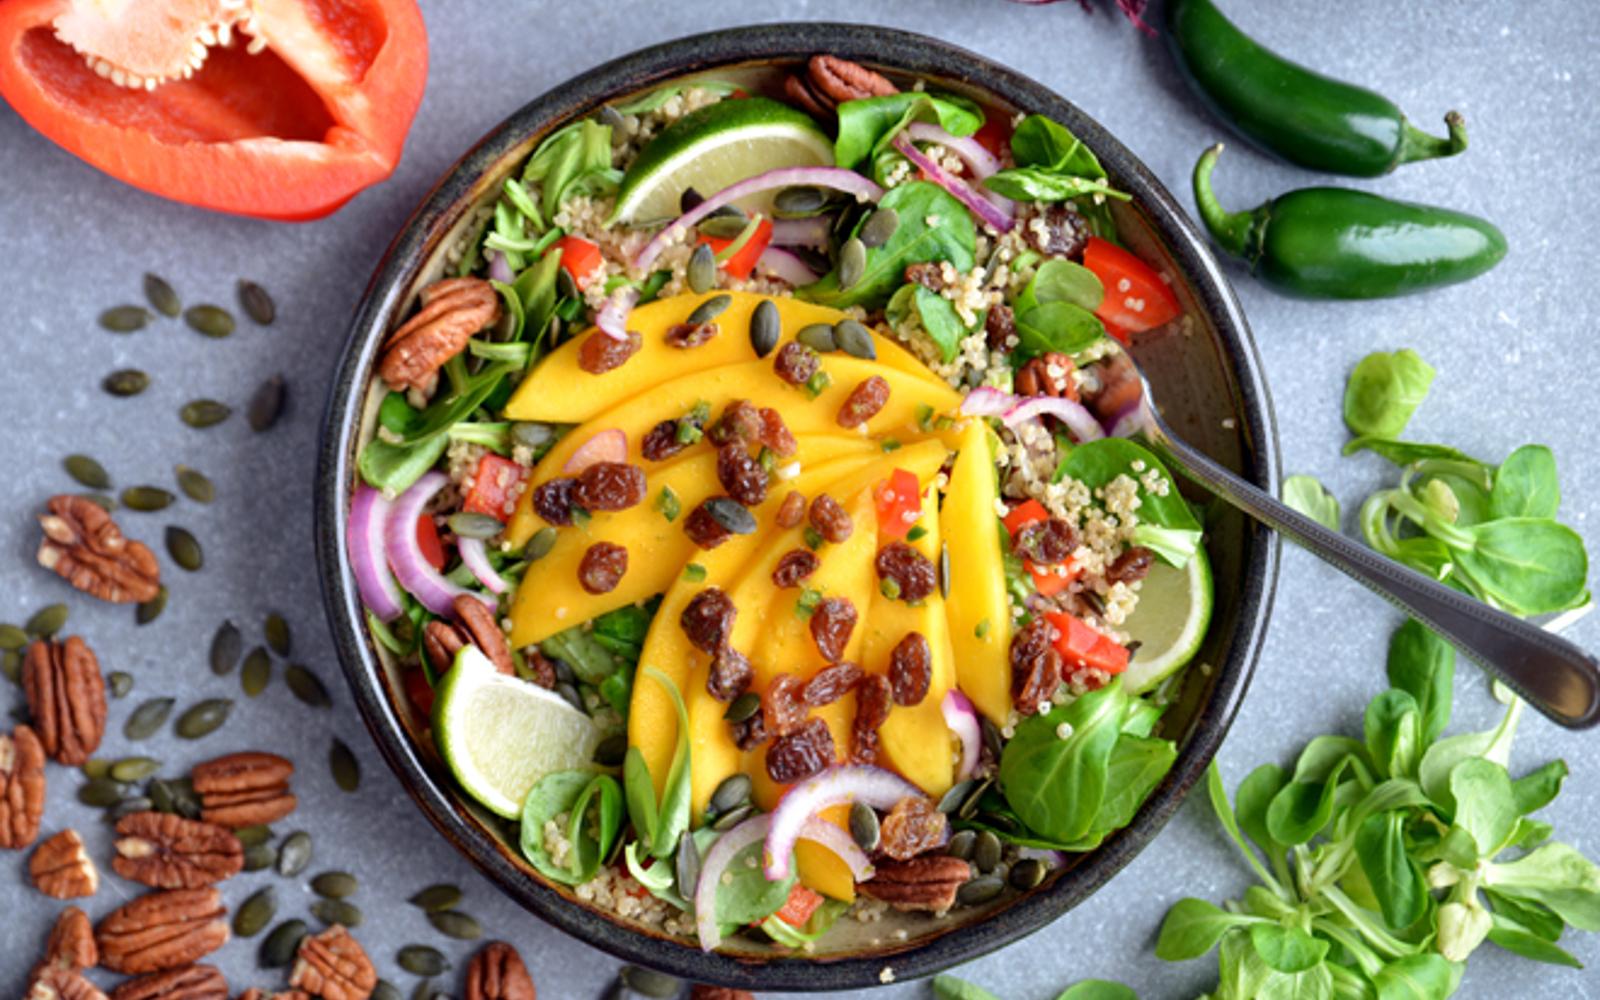 http://www.onegreenplanet.org/vegan-recipe/mango-chili-and-lime-quinoa-salad/